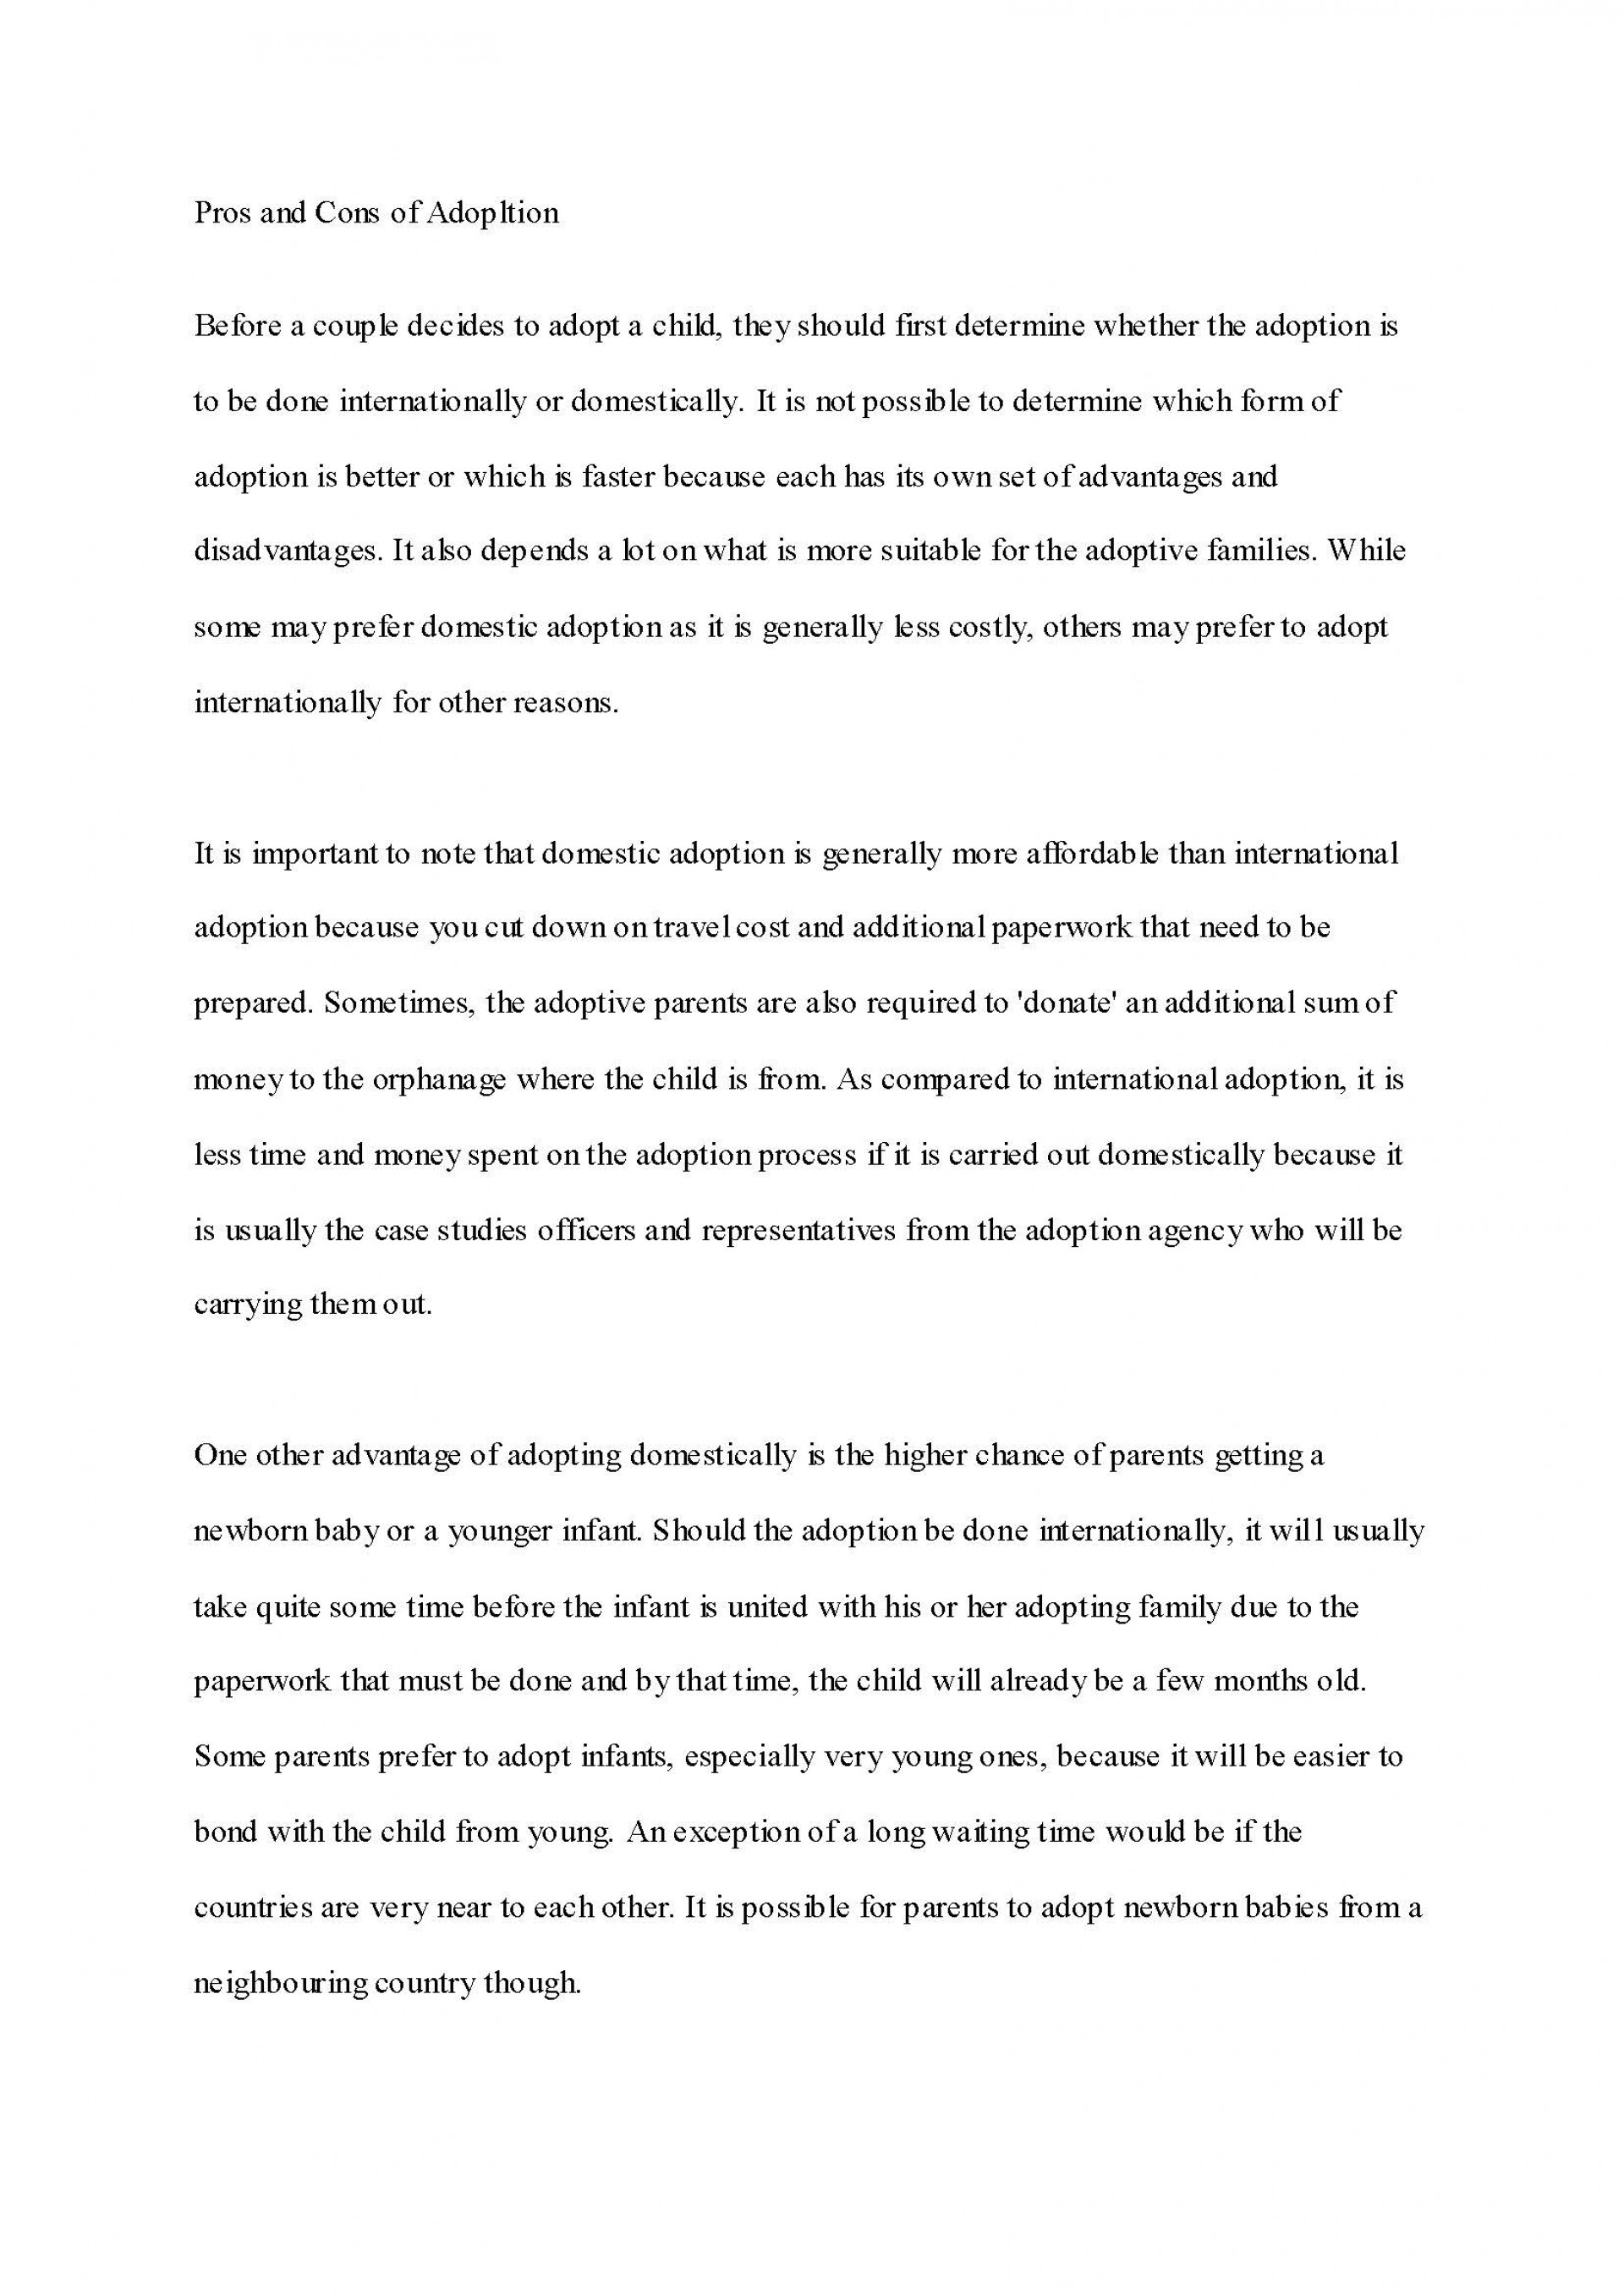 022 Essay Example Scholarship Prompts Adoption Magnificent Robertson 2018-19 Vanderbilt Washington And Lee Johnson 1920